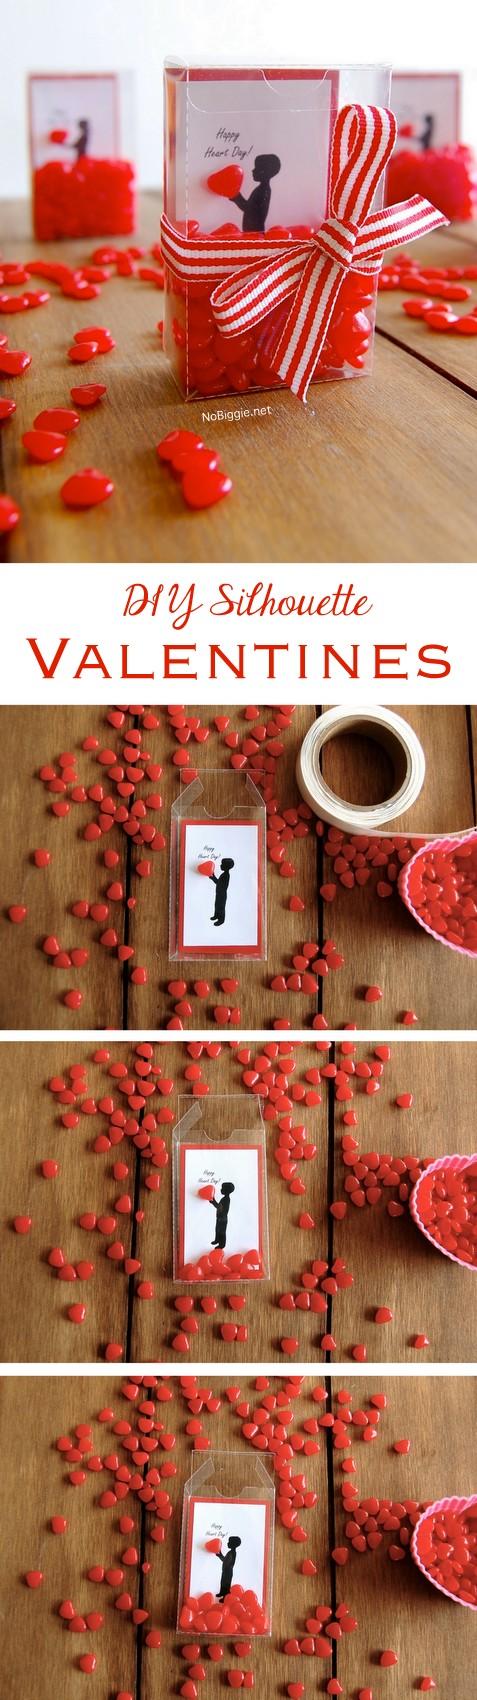 DIY silhouette Valentines | NoBiggie.net